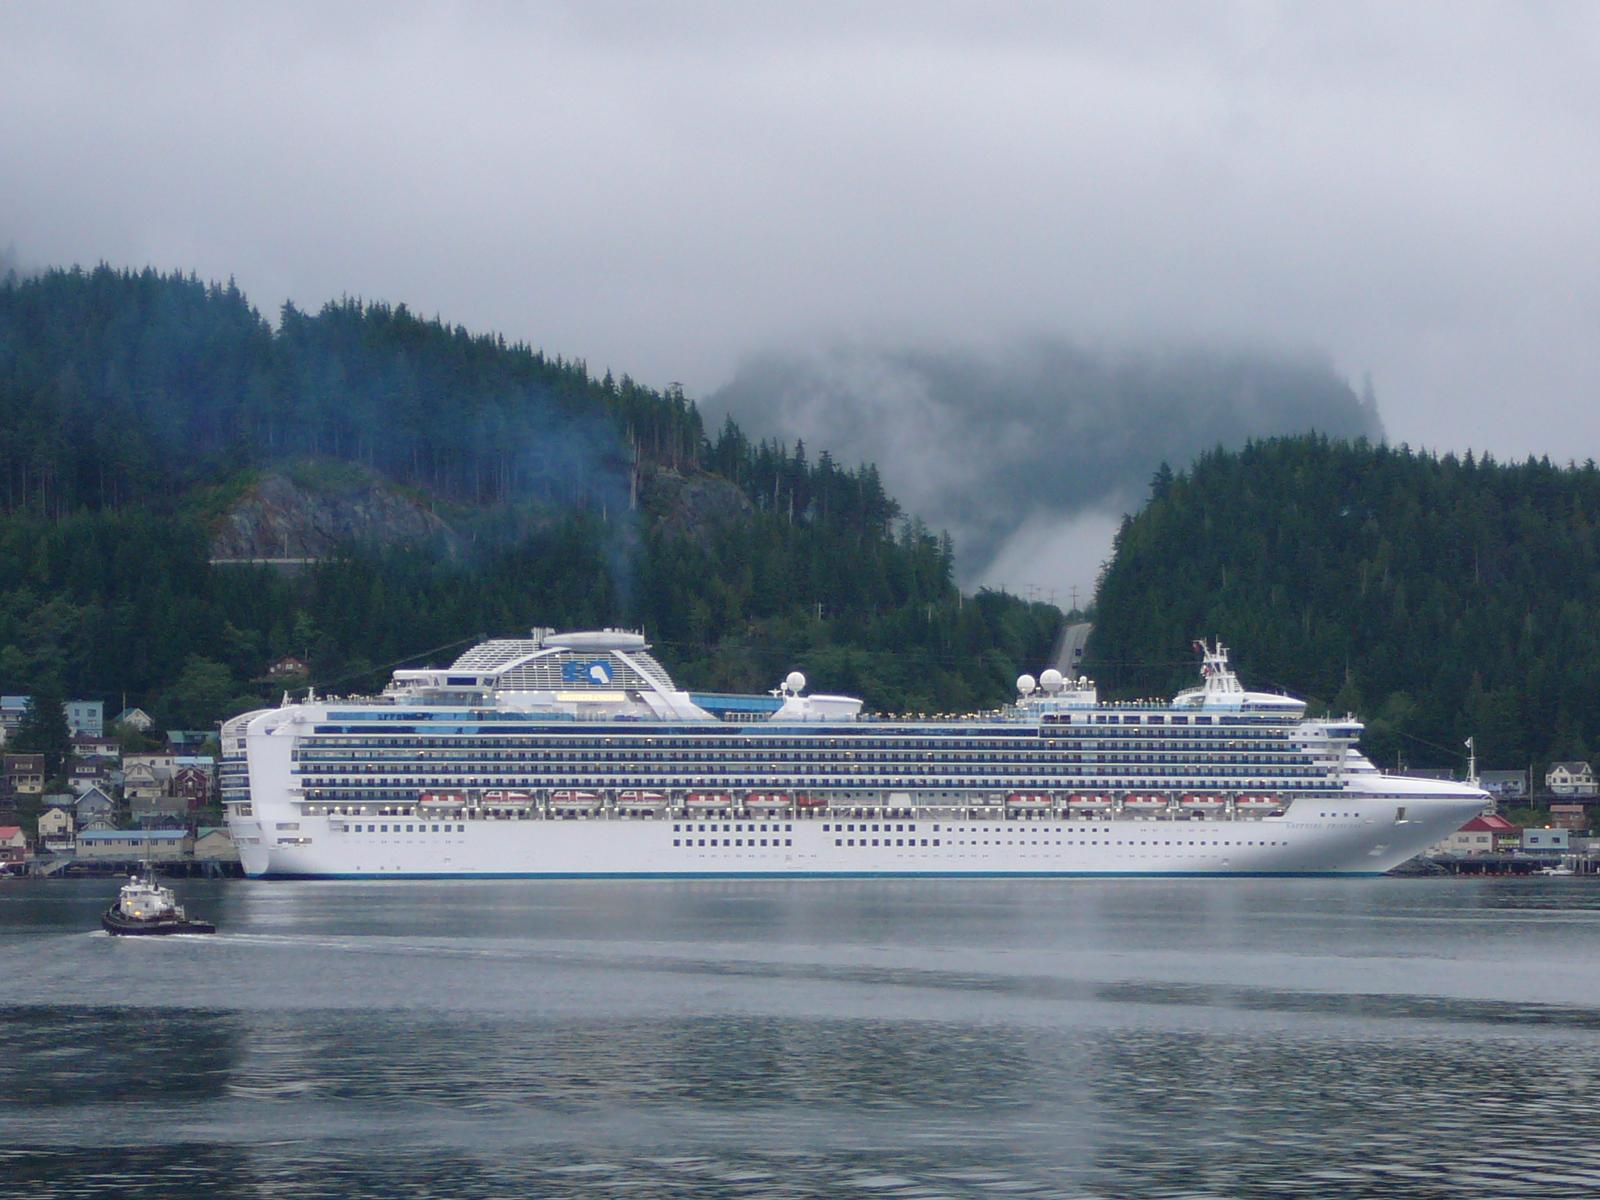 Alaska Senate Passes Bill Relaxing Cruise Ship Wastewater Discharge Rules